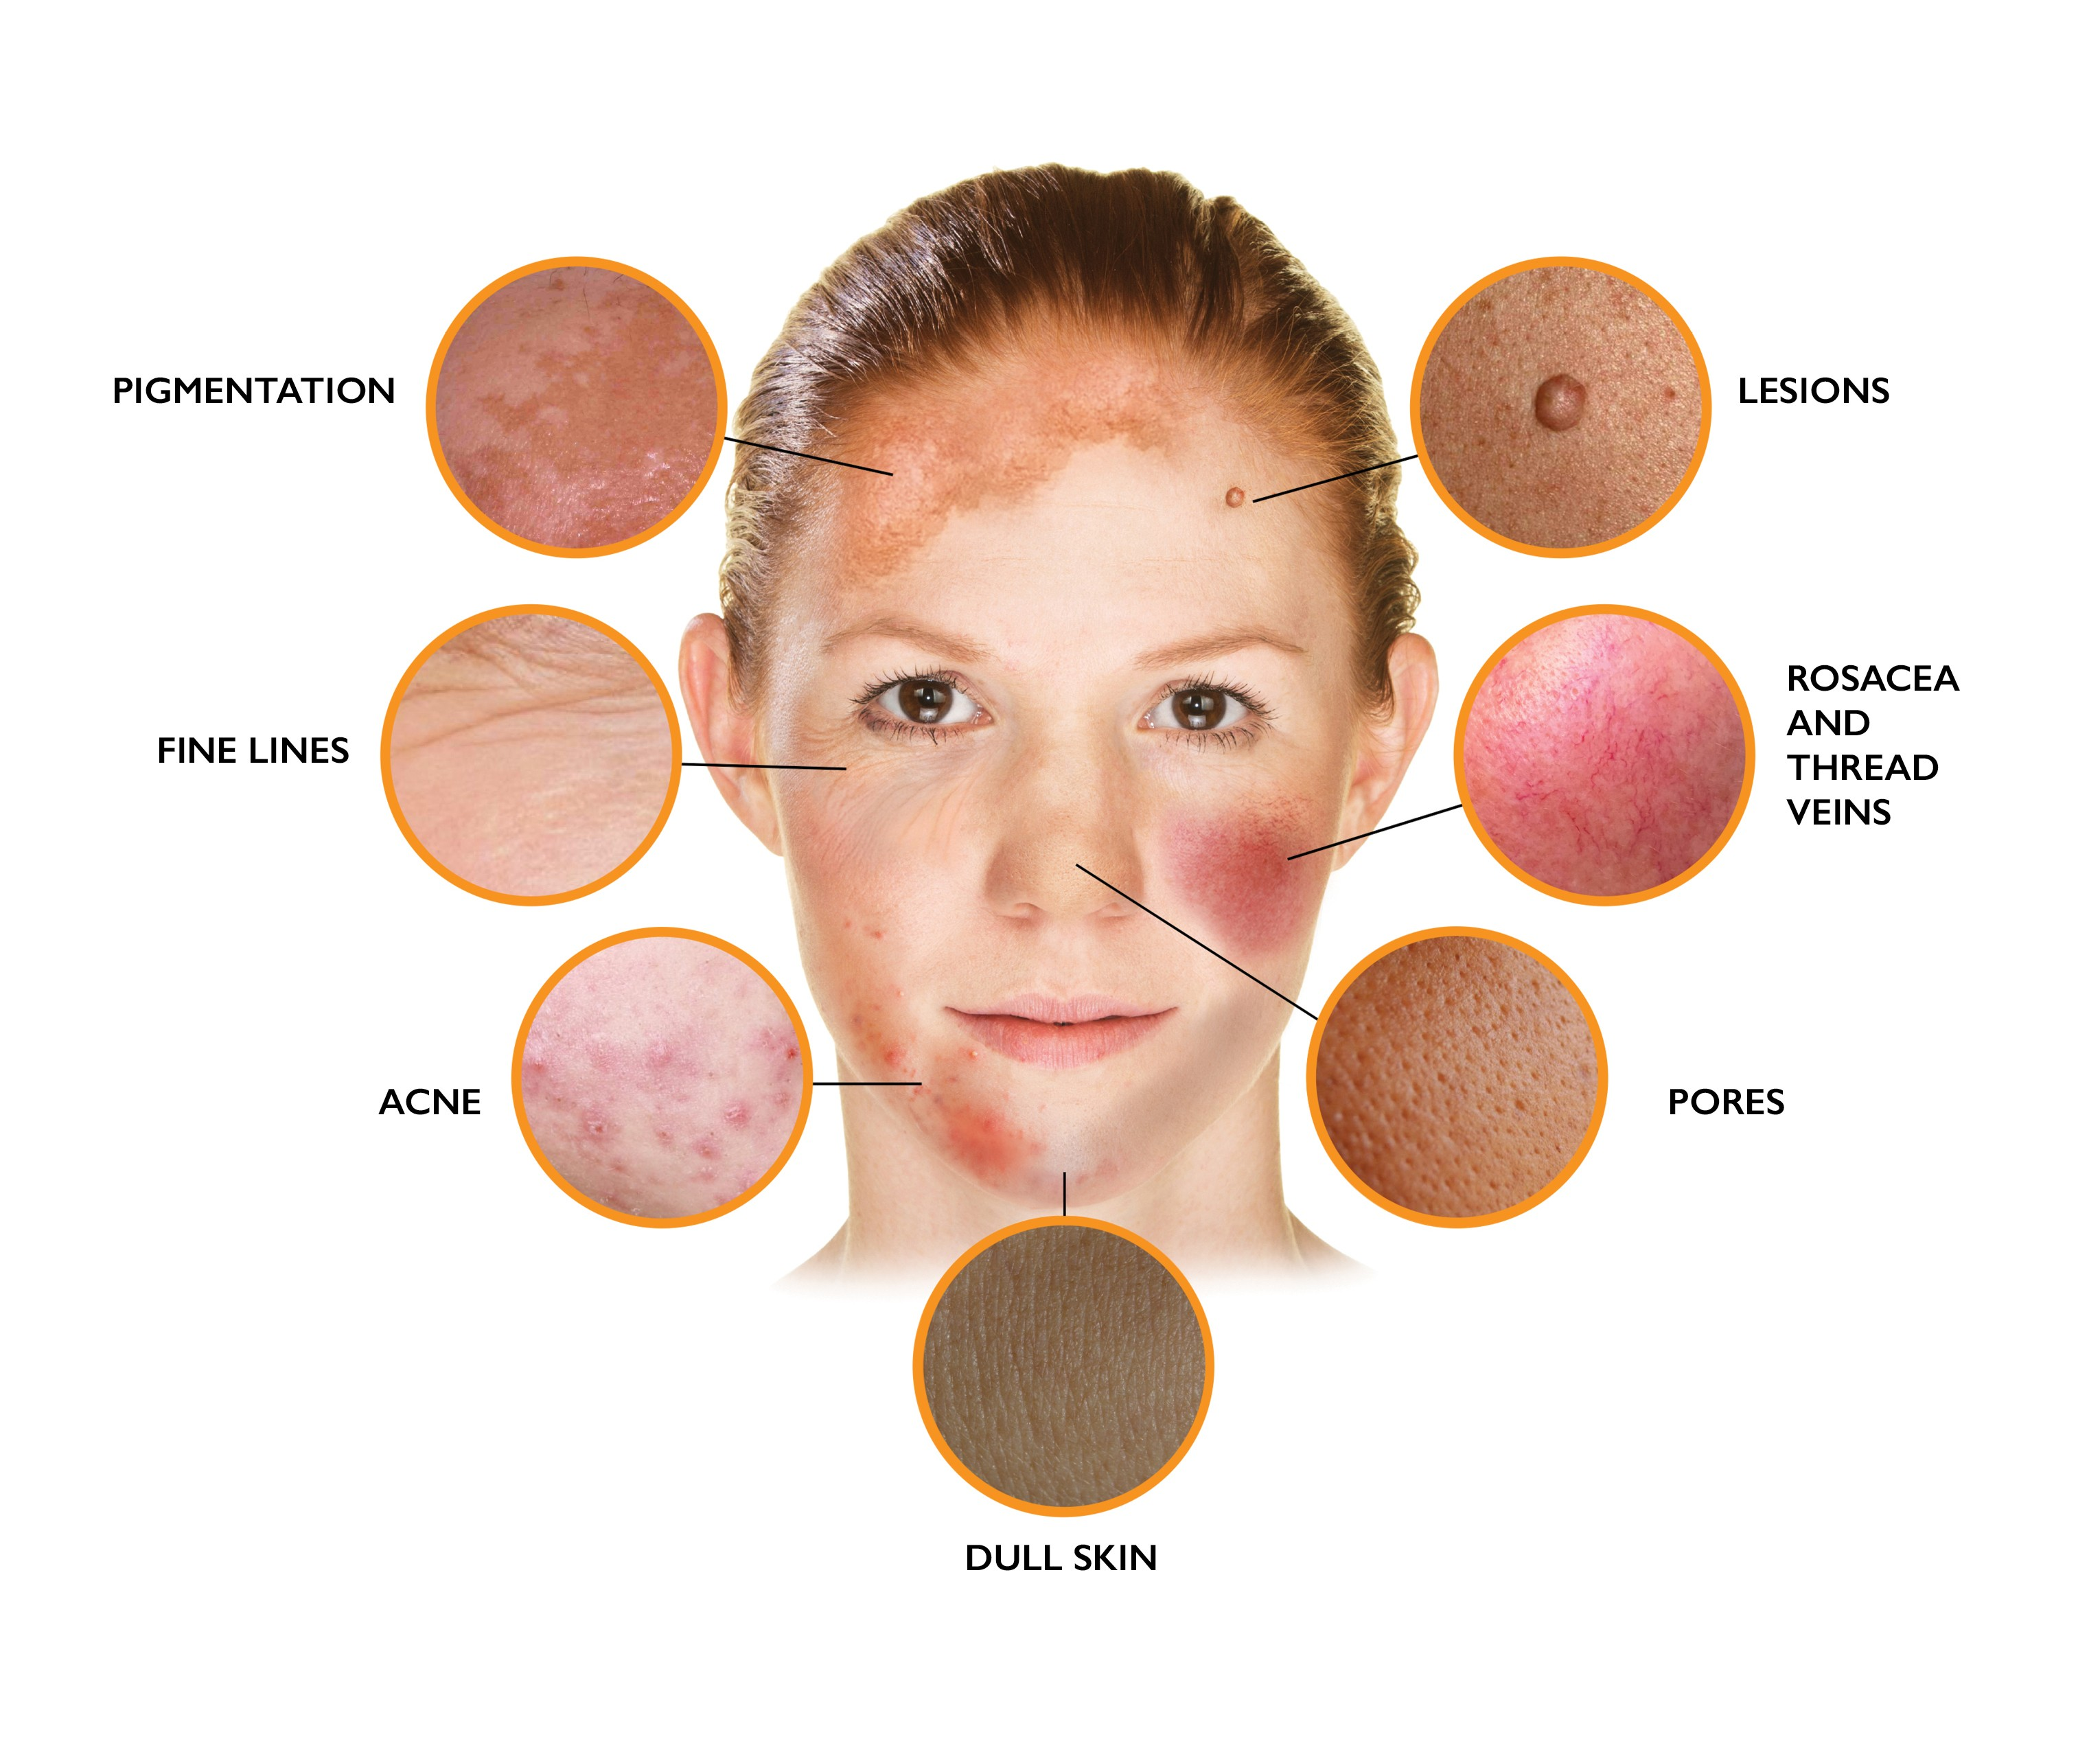 Problem skin image